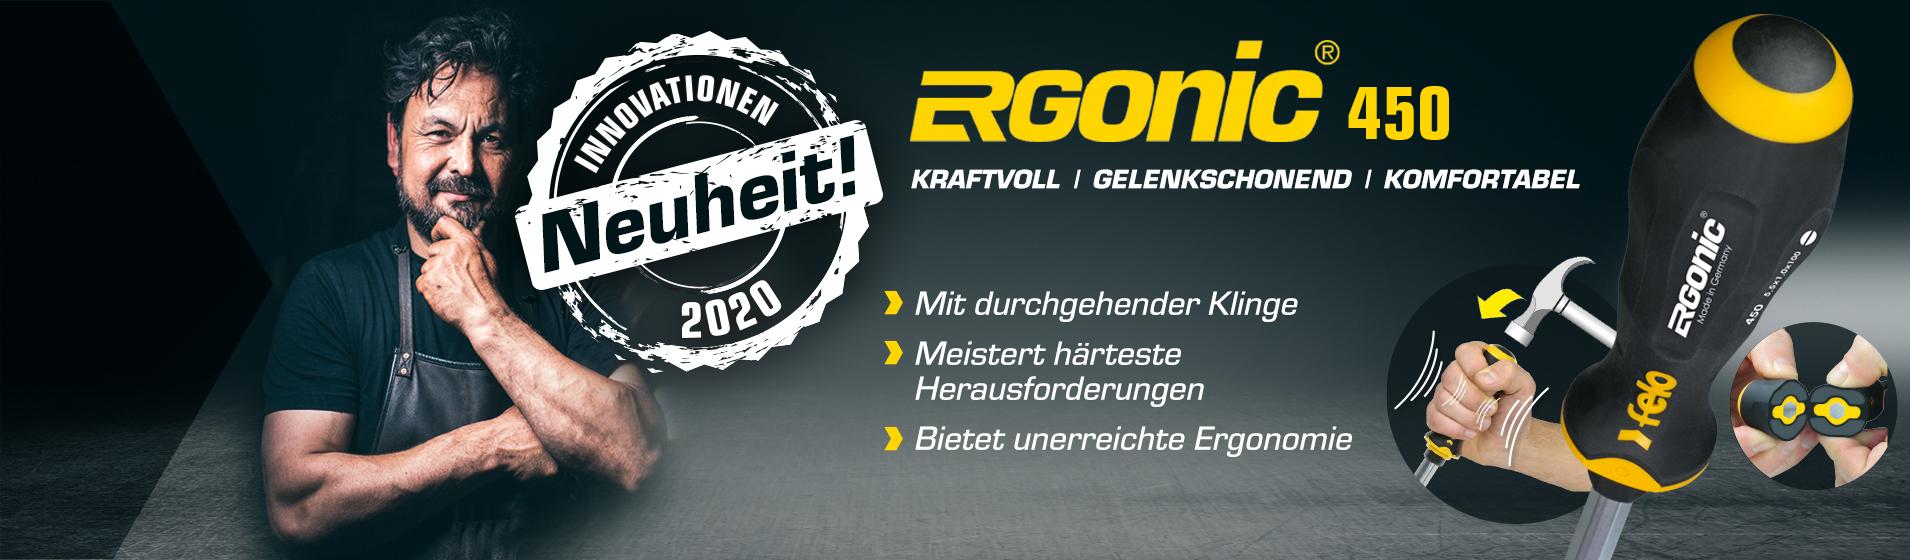 Schlagkappen-Schraubendreher ERGONIC Serie 450 von Felo